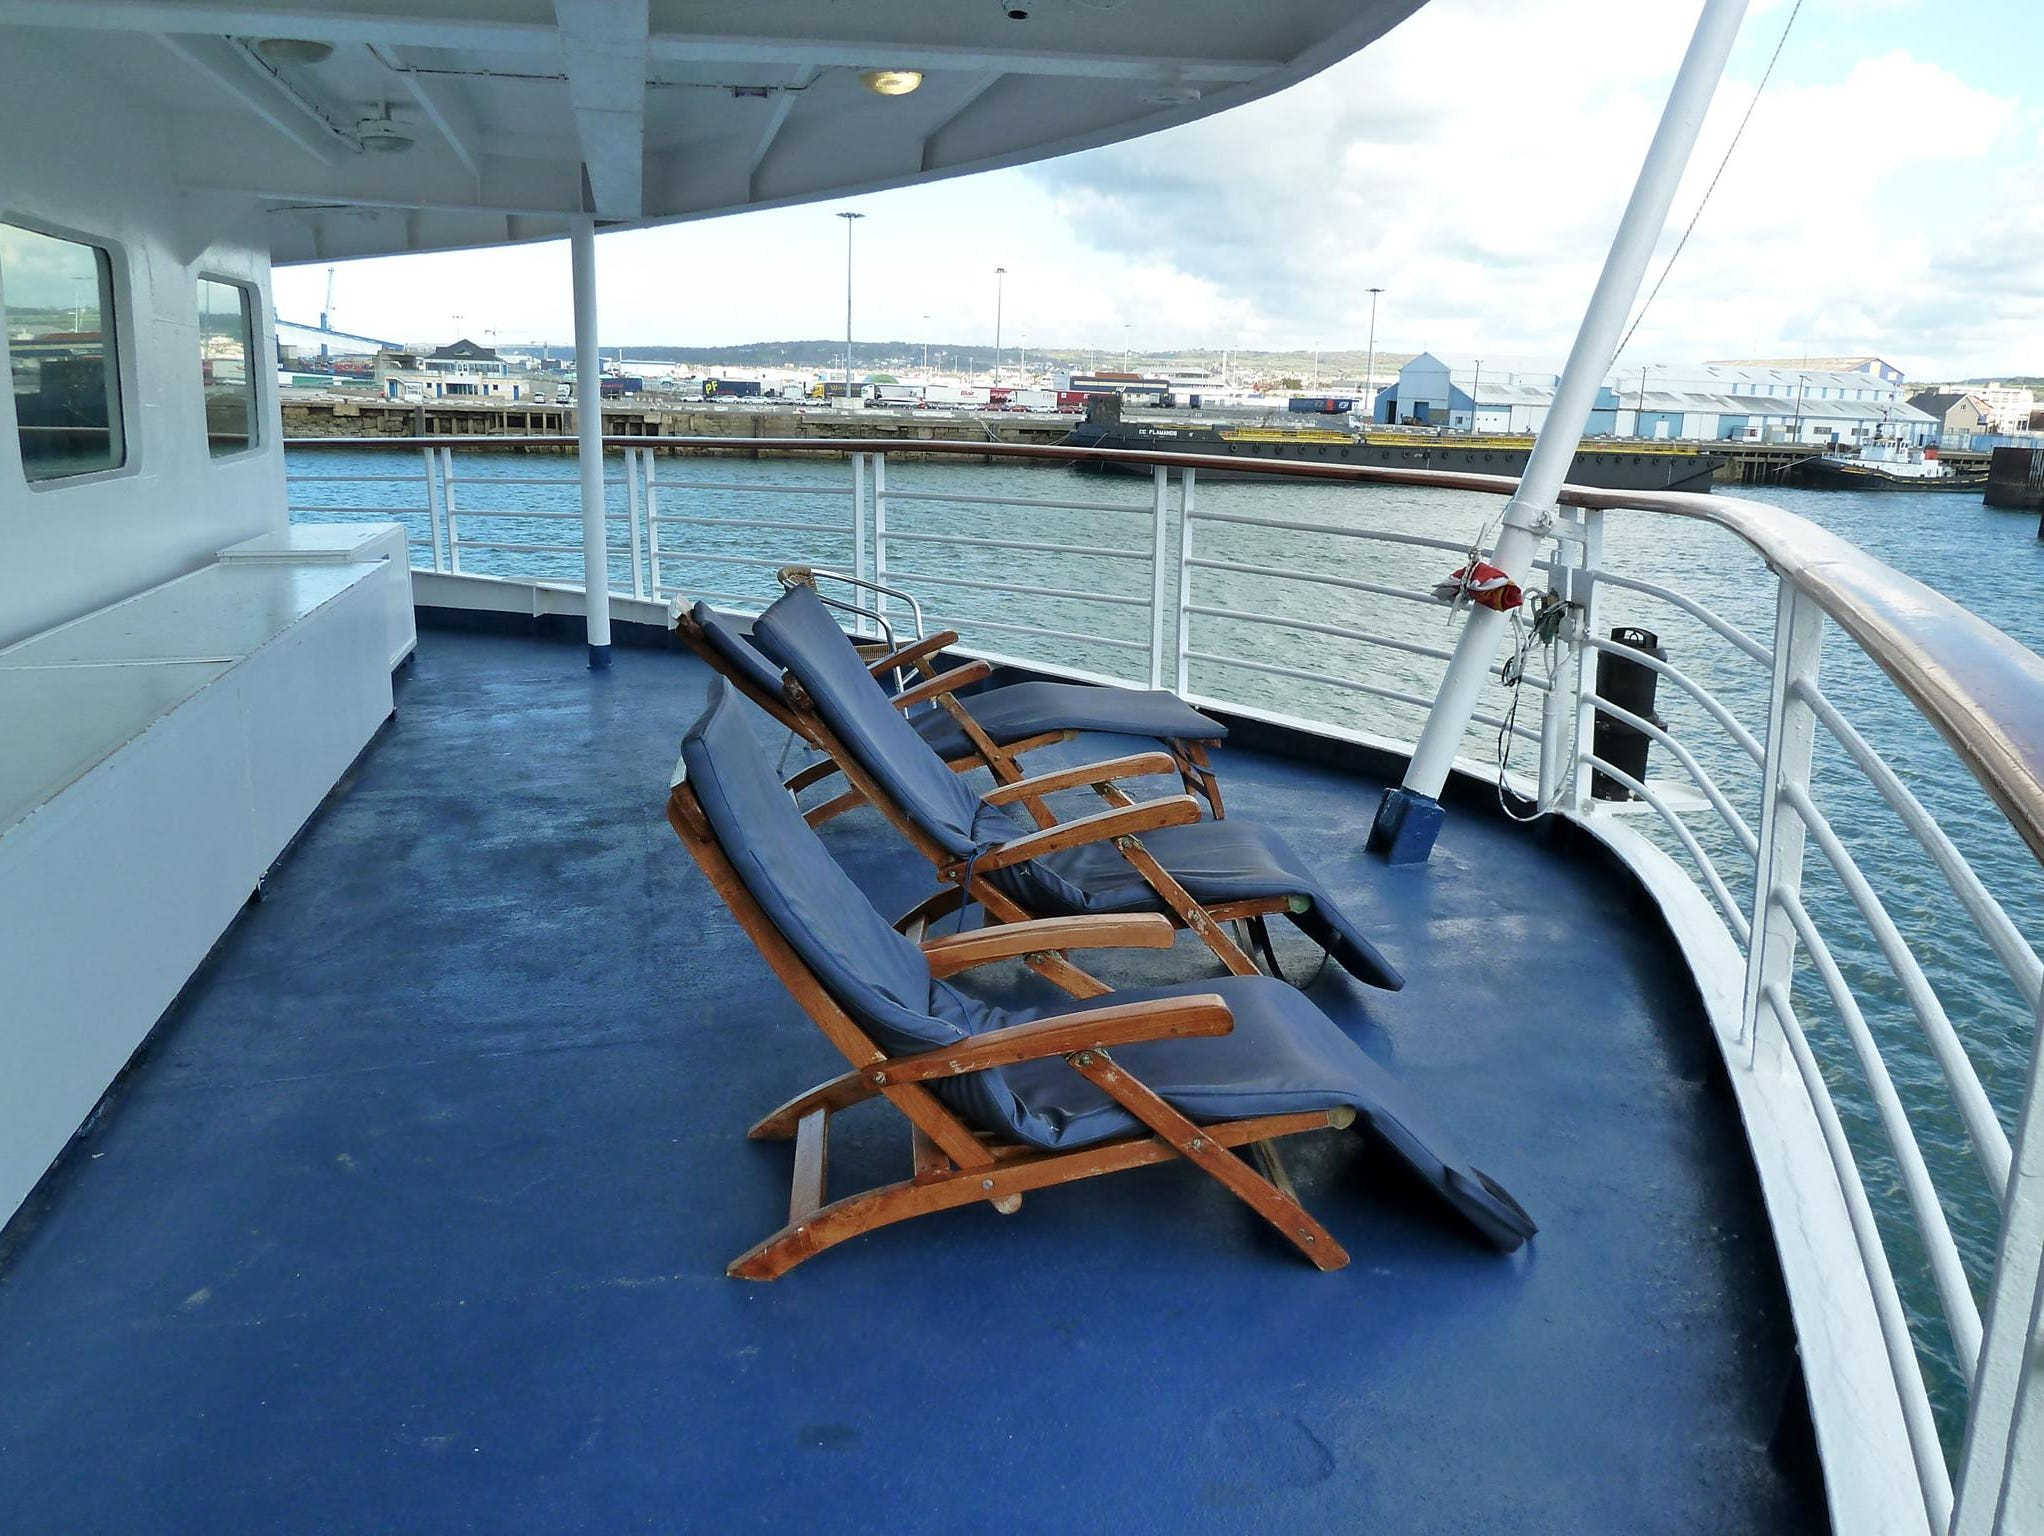 cruise ship tours marco polo. Black Bedroom Furniture Sets. Home Design Ideas